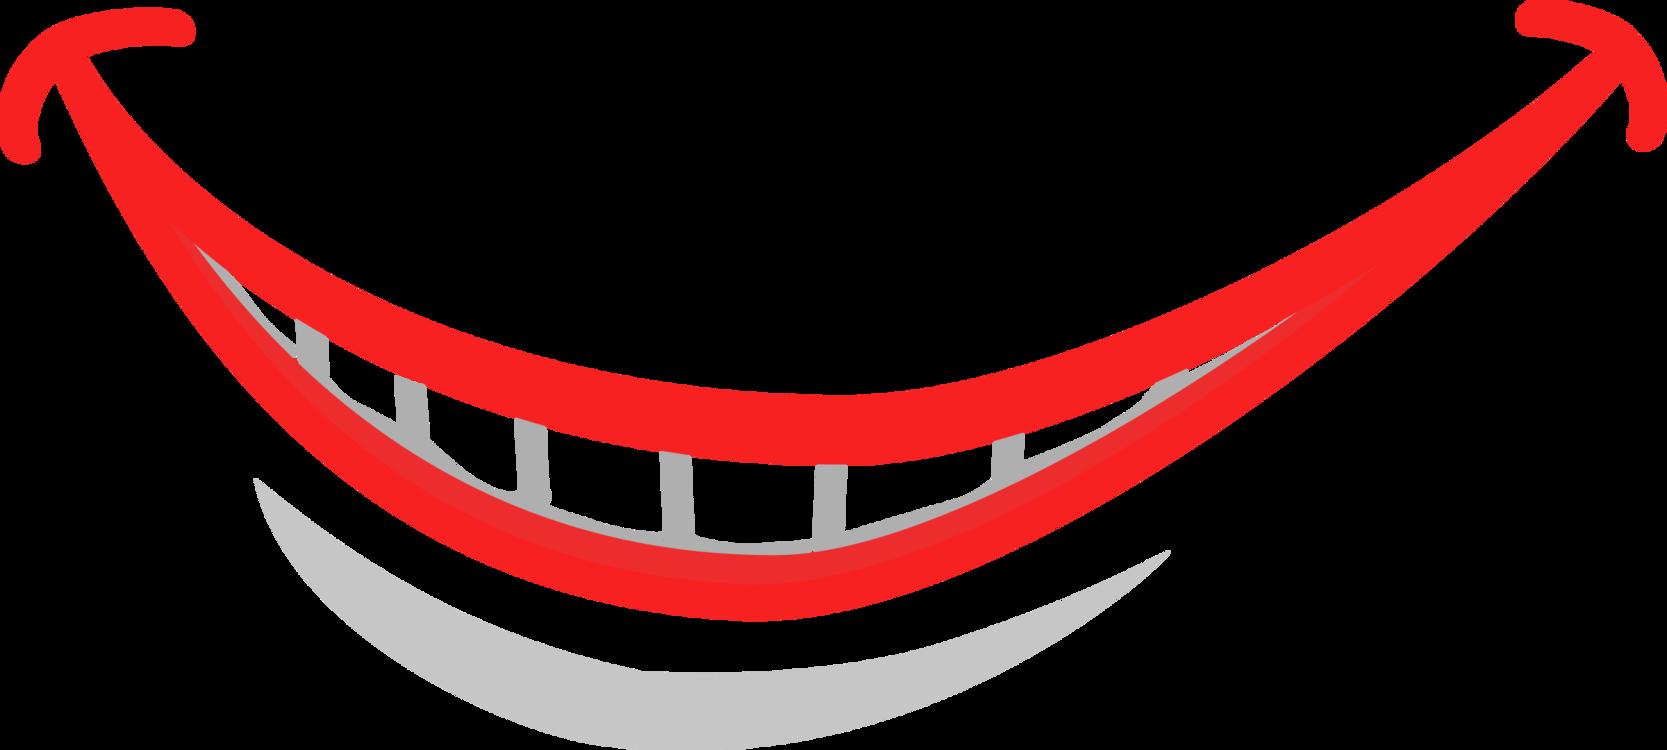 Line,Smiley,Smile